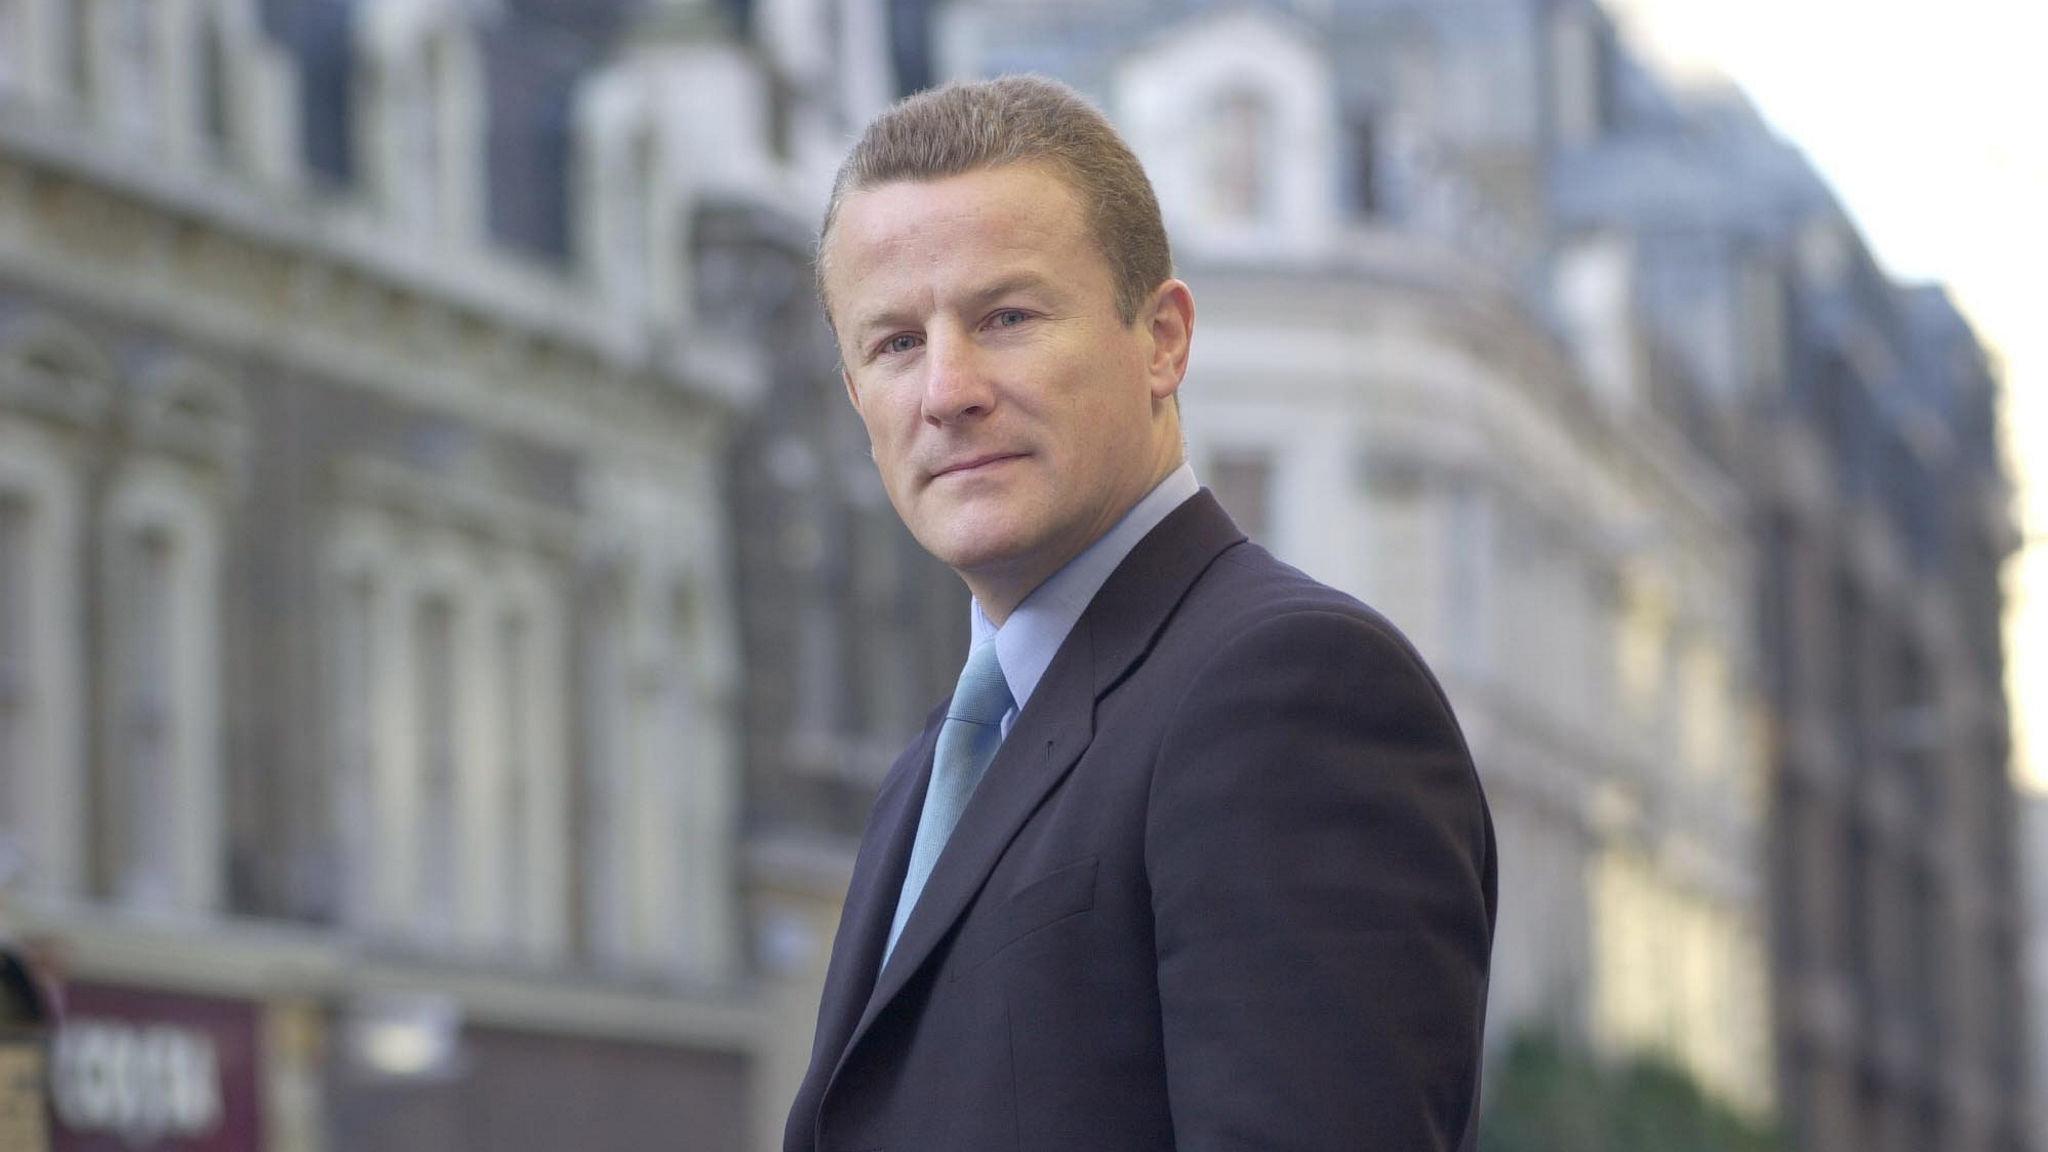 Neil Woodford affair focuses spotlight on platforms